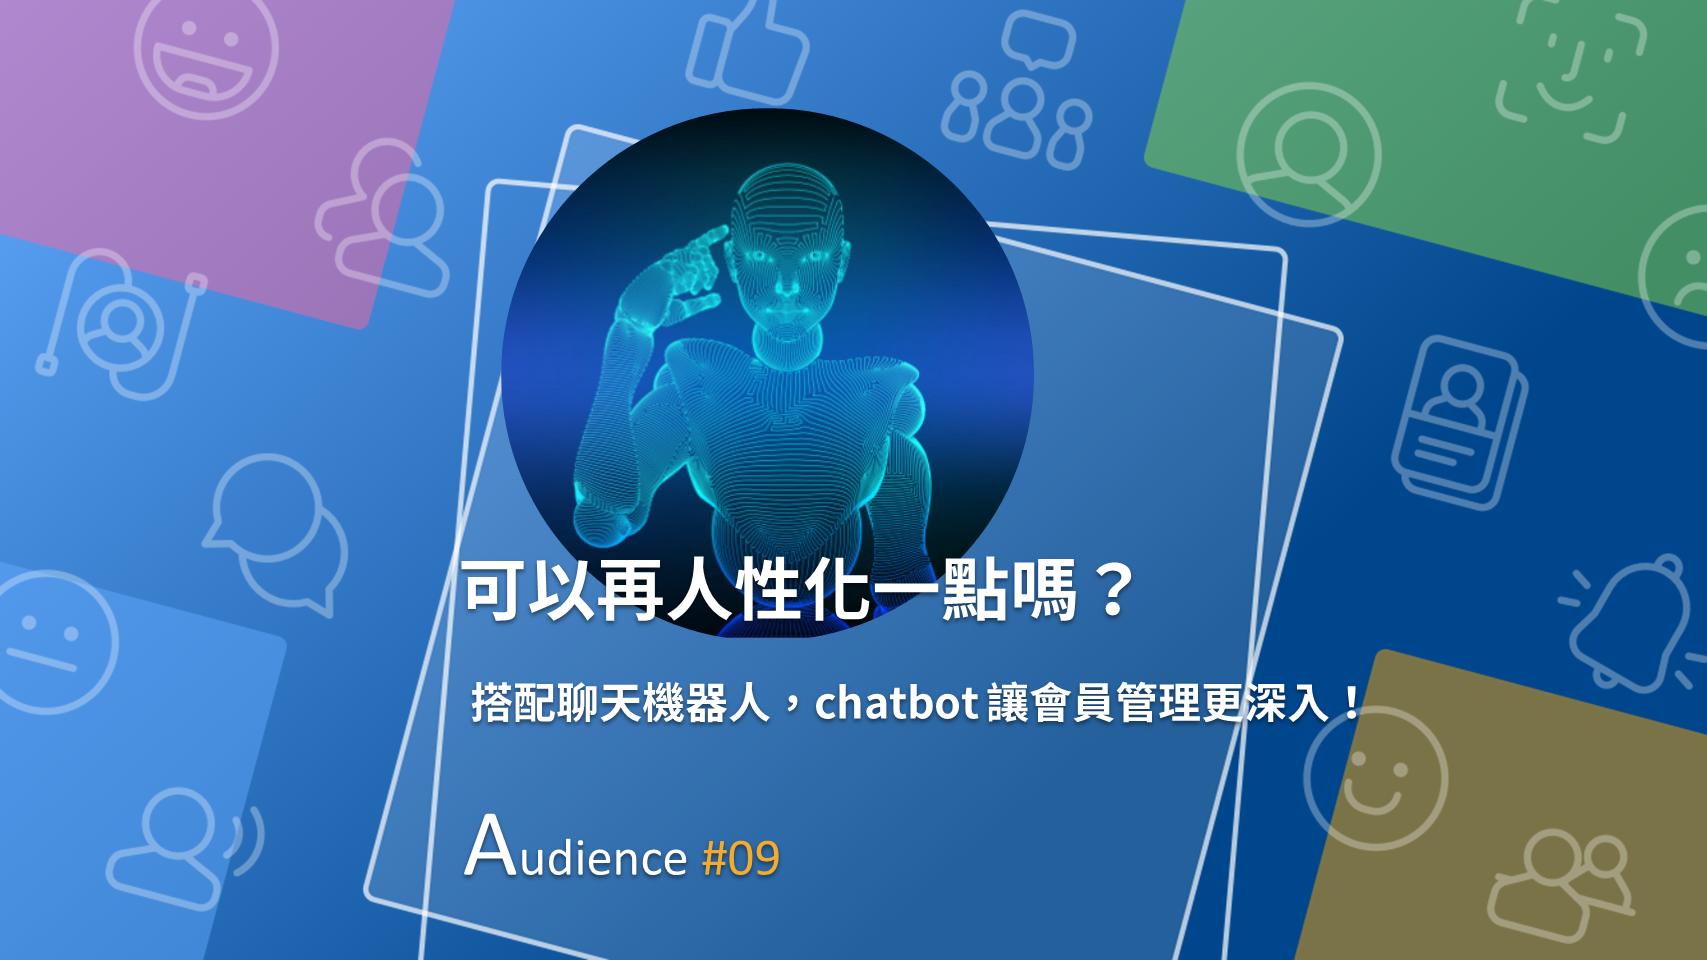 chatbot 與 CRM 的結合,迸出新火花!